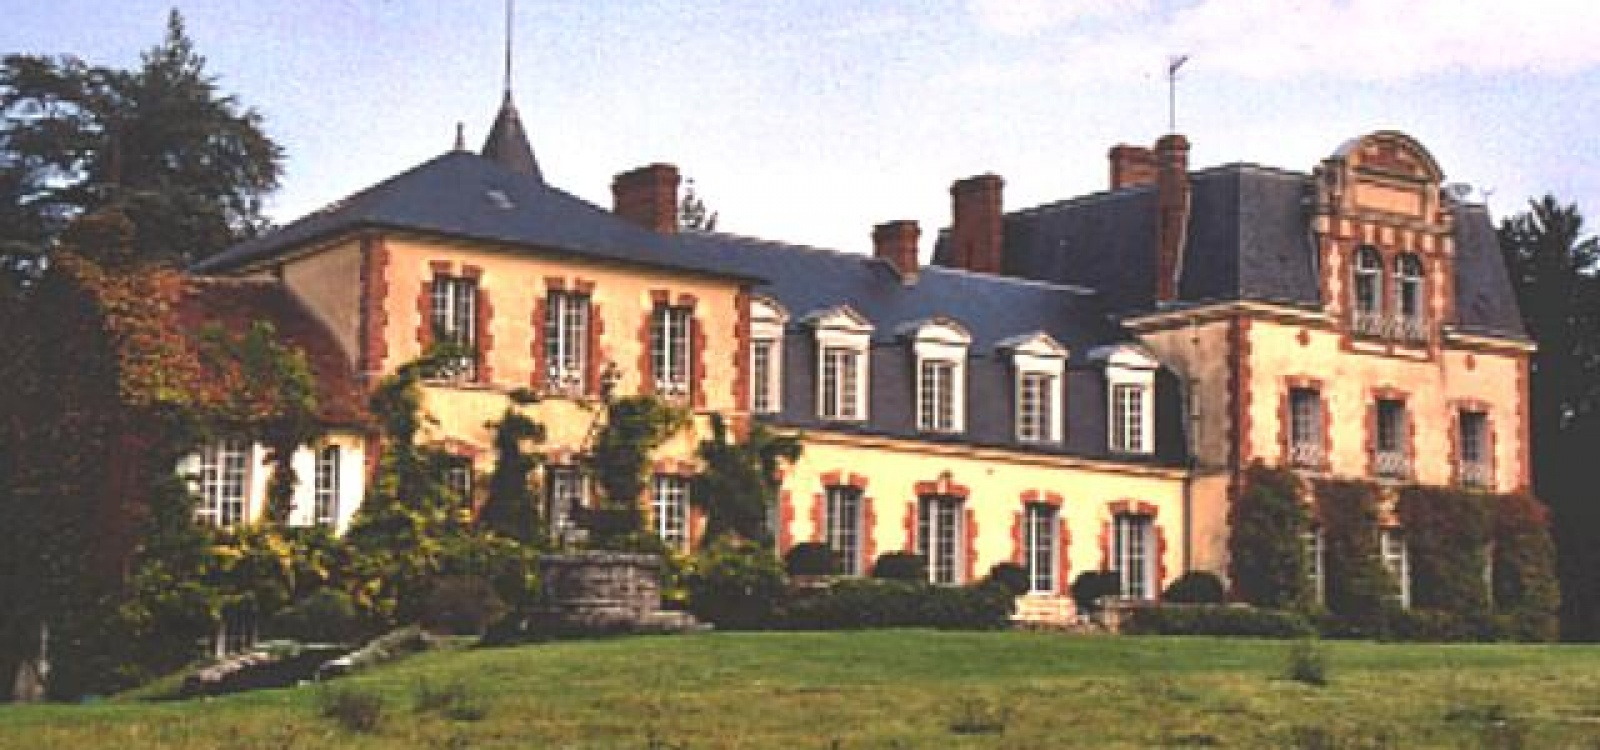 Orne,France,Villa,1057